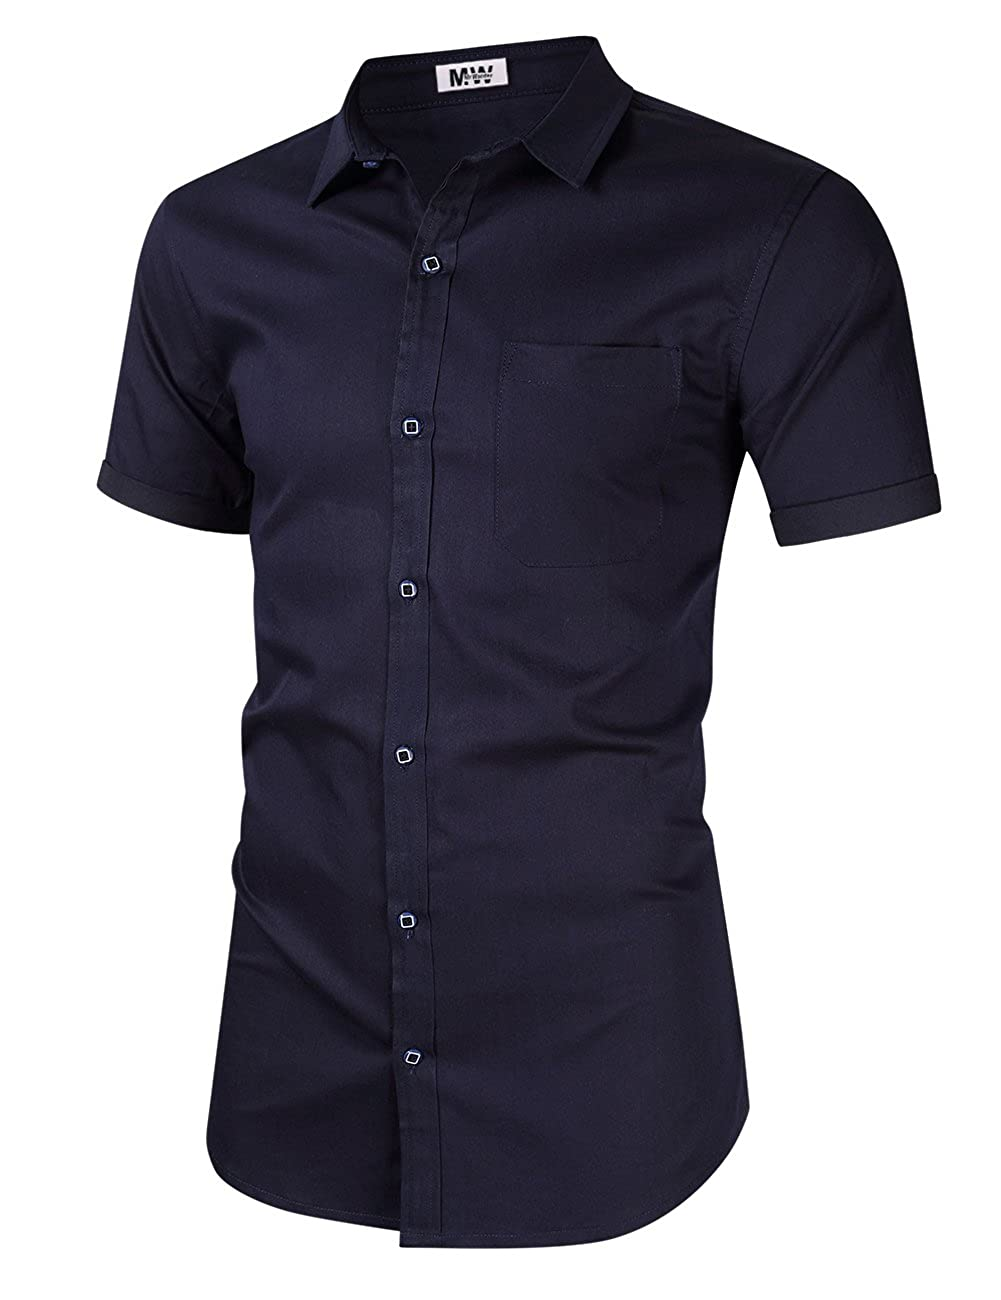 137eedad0 MrWonder Men's Casual Slim Fit Button Down Dress Shirt Short Sleeve Denim  Shirts Jean Shirt at Amazon Men's Clothing store: